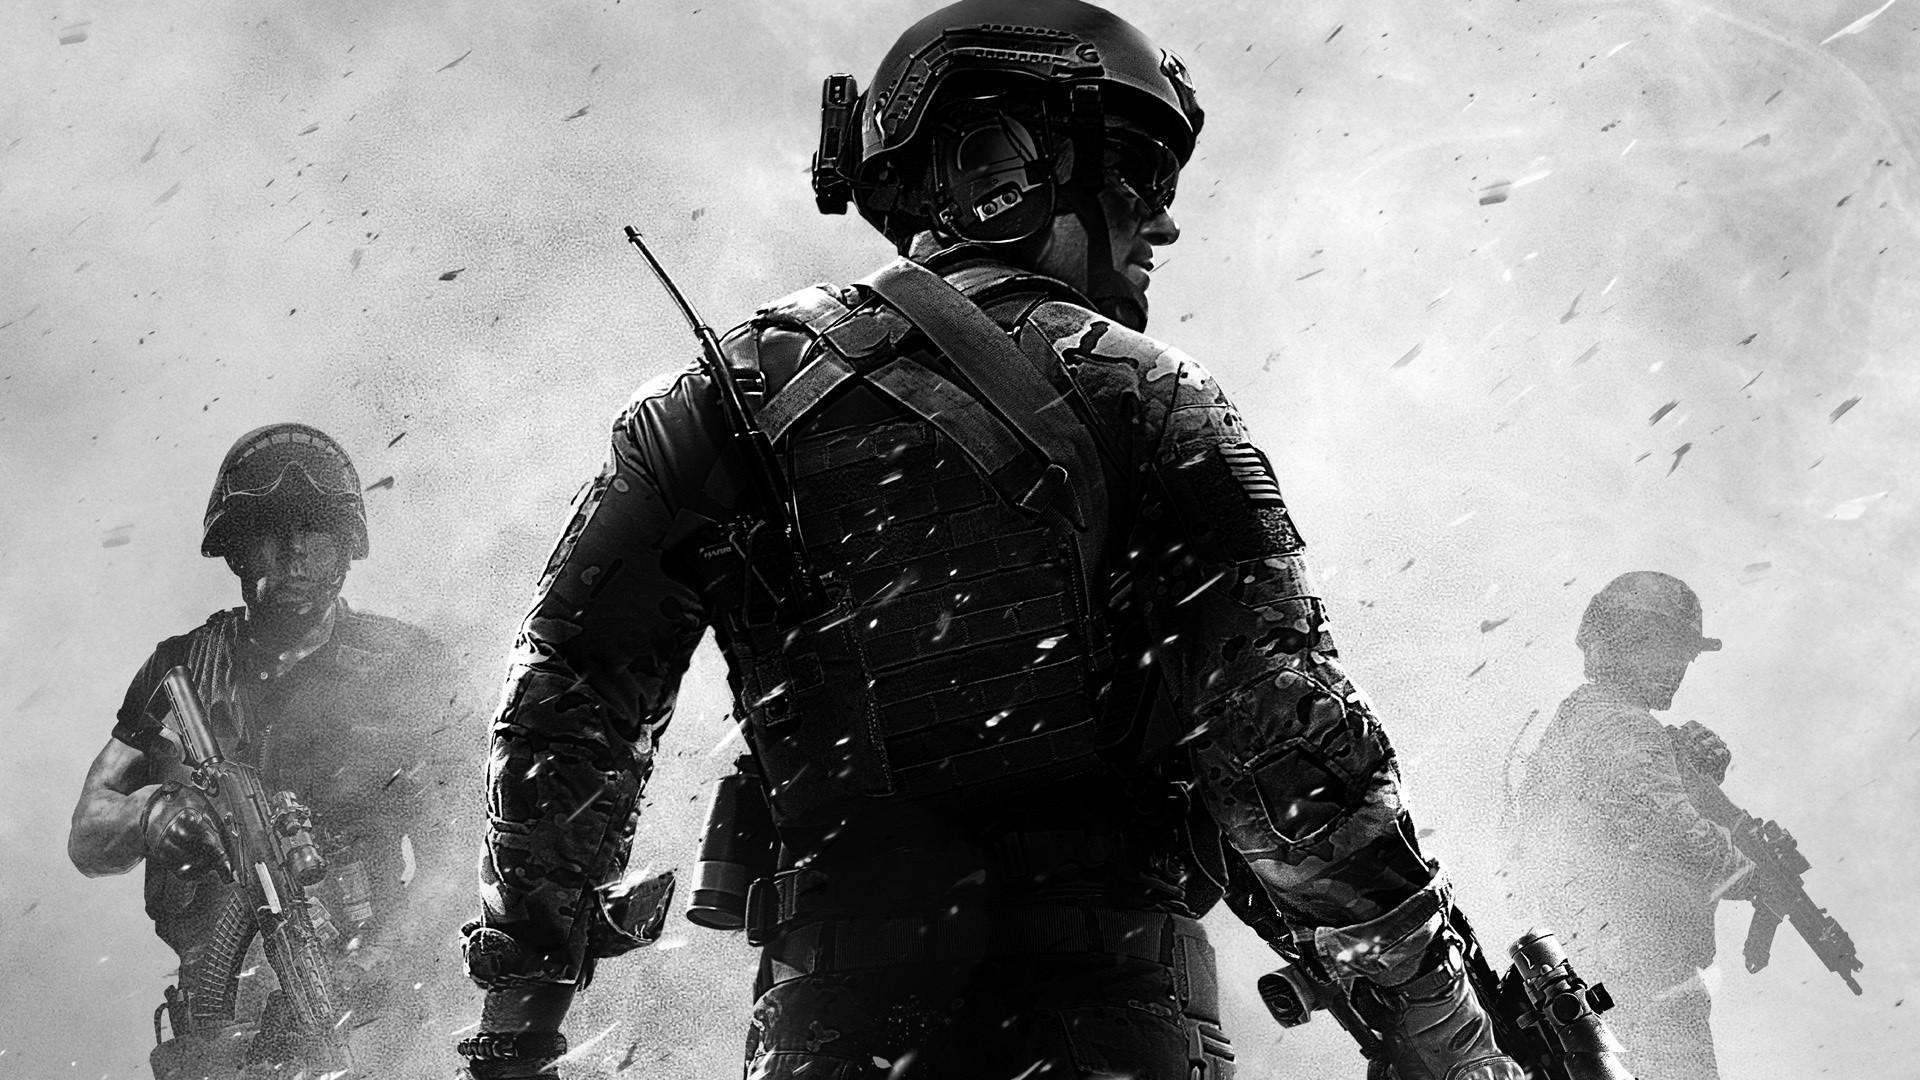 Photo Call Of Duty 4 Modern Warfare Games 1920x1080